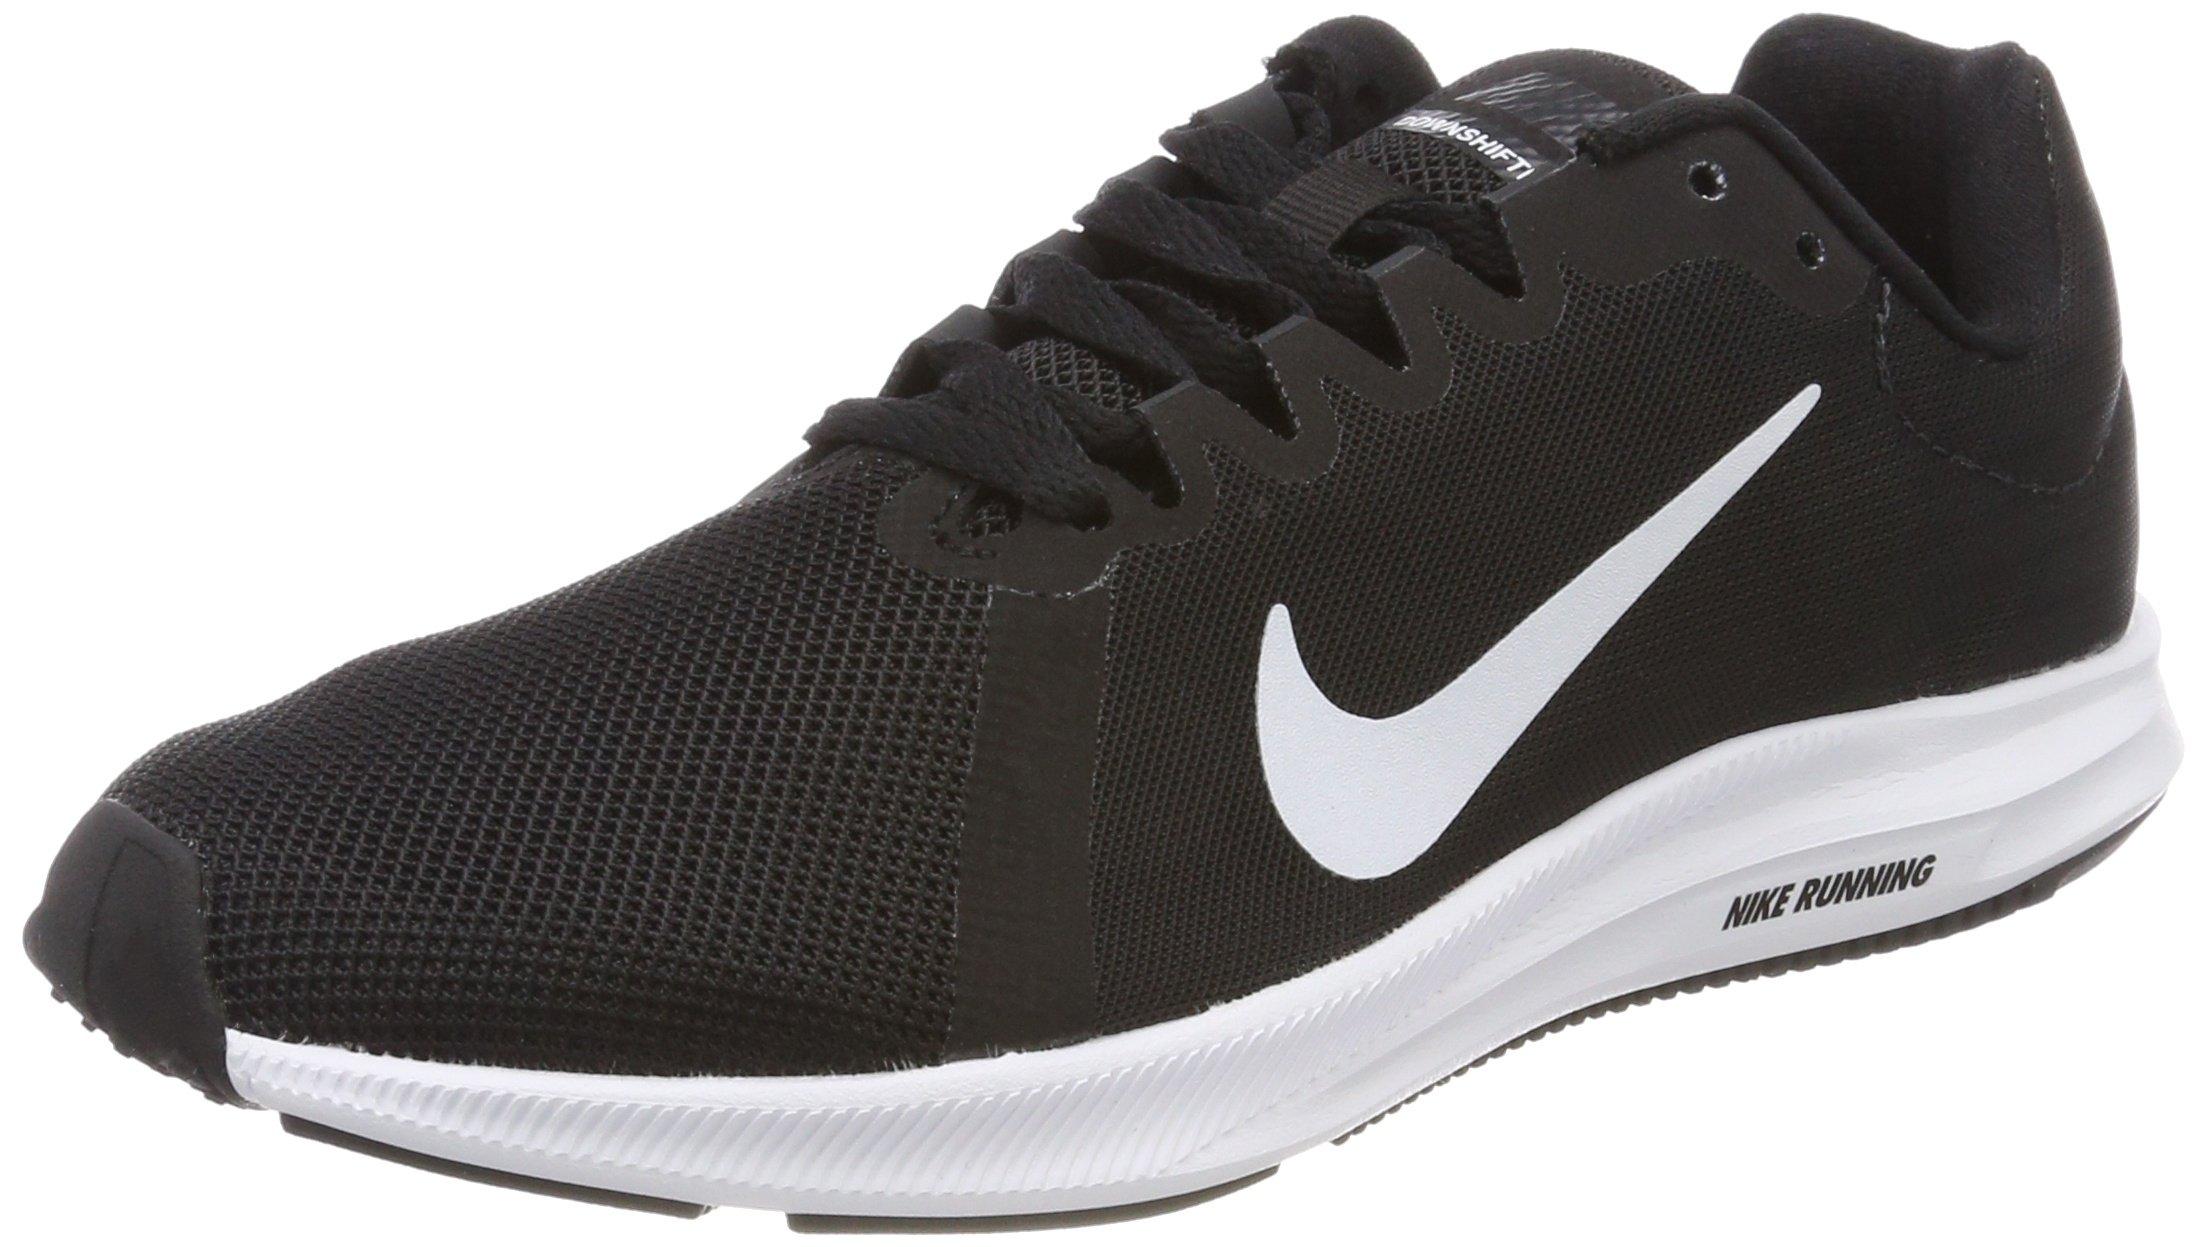 efaa8df8e622a Nike Women's Downshifter 8 Running Shoe, Black/White/Anthracite, 9 Regular  US